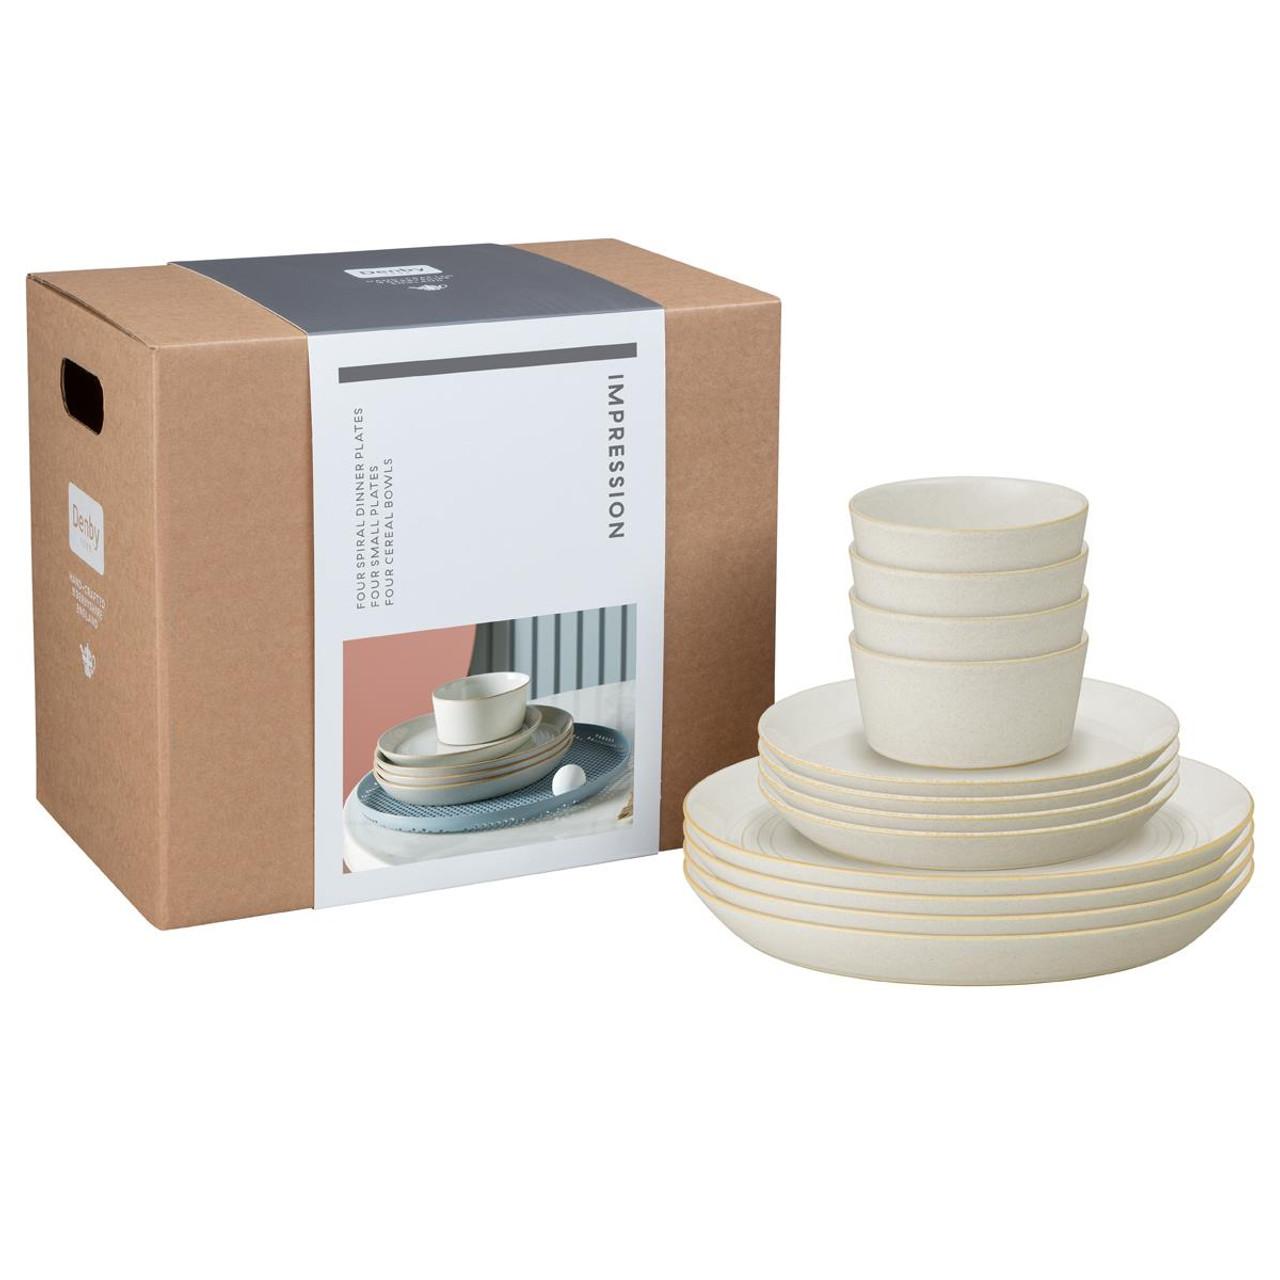 Denby Impression Cream 12 Piece Tableware Set